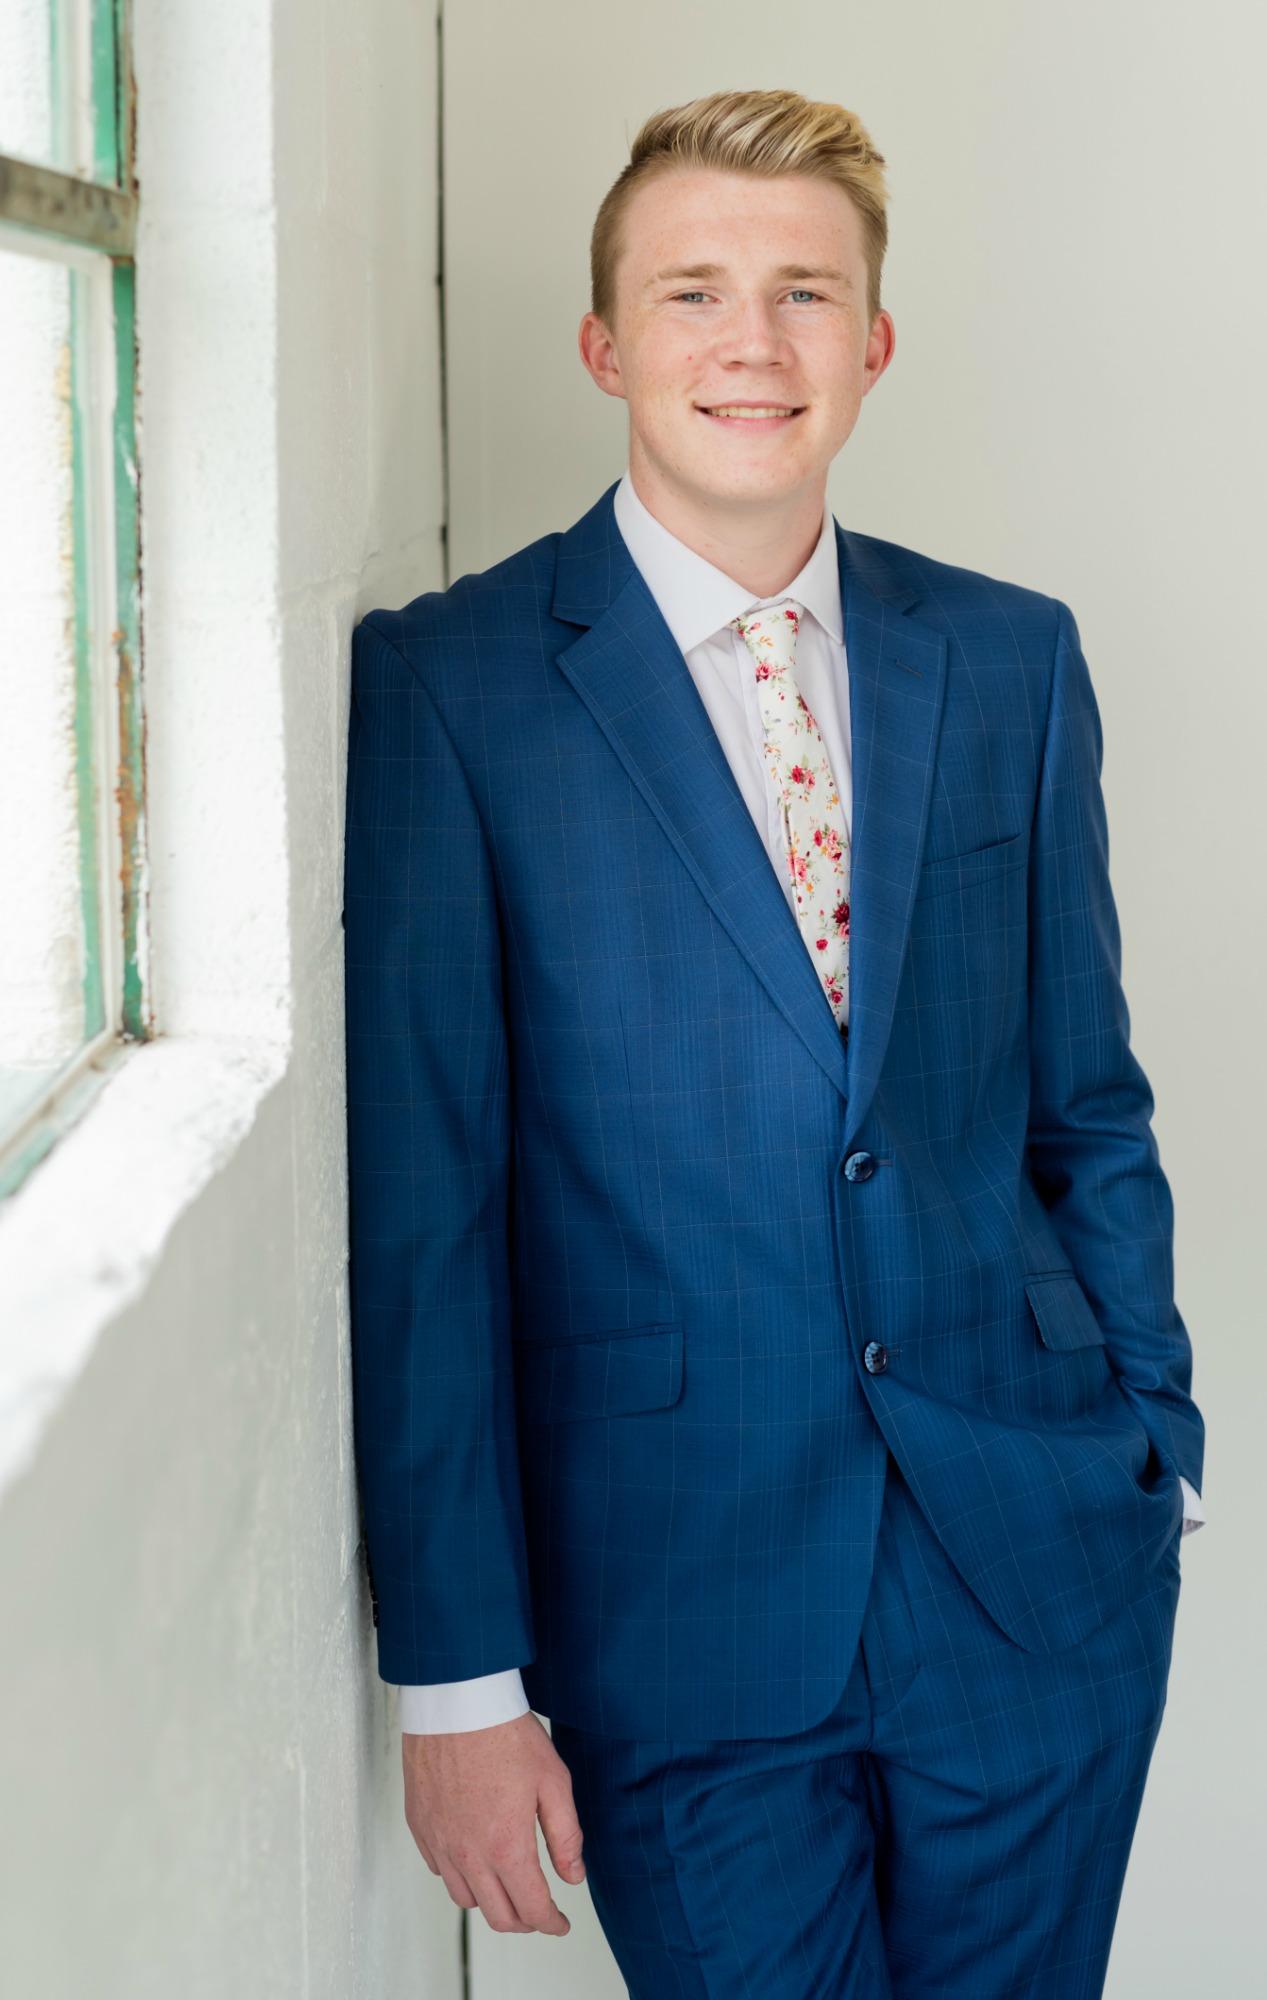 Blue  Suit in a Window Pane Plaid